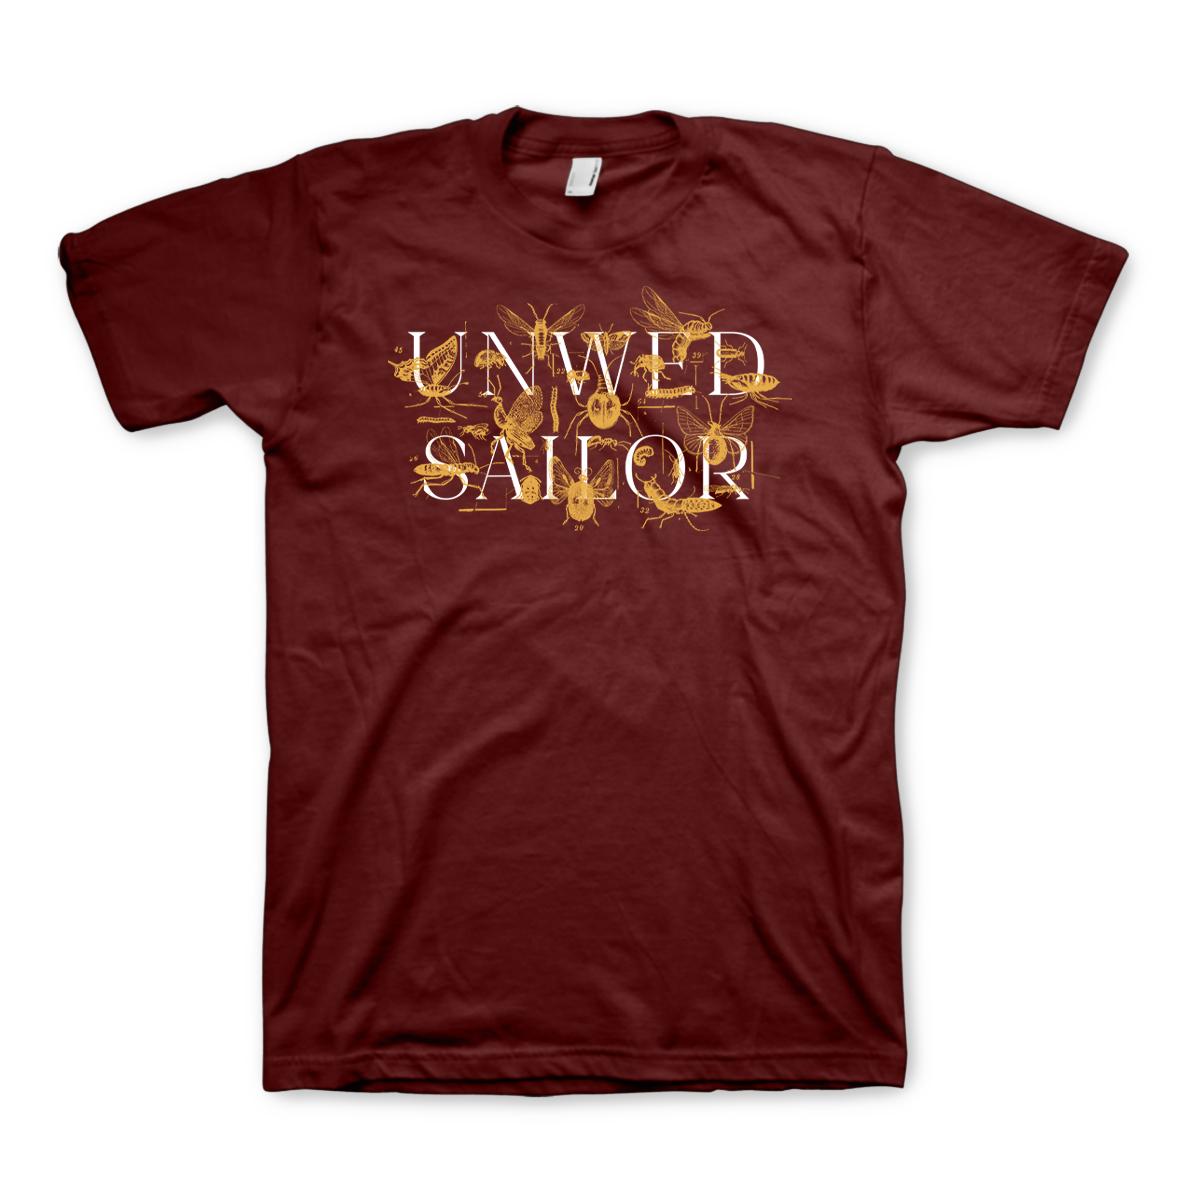 Unwed Sailor - Bugs T-Shirt